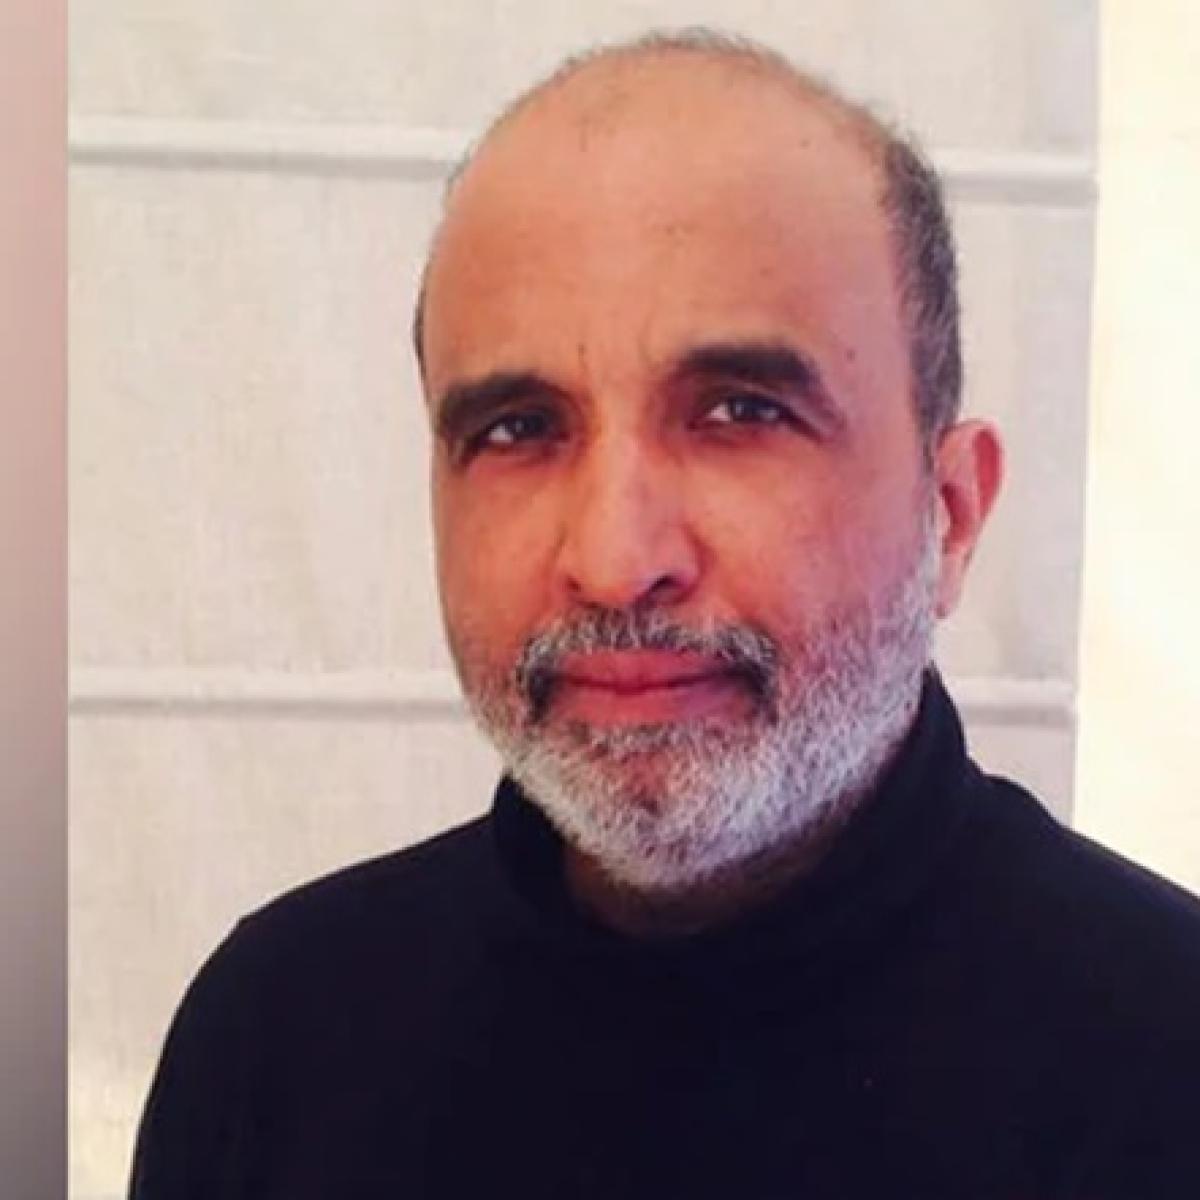 'I am very happy': Congress' Sanjay Jha recovers from coronavirus, to be under 2 week home quarantine